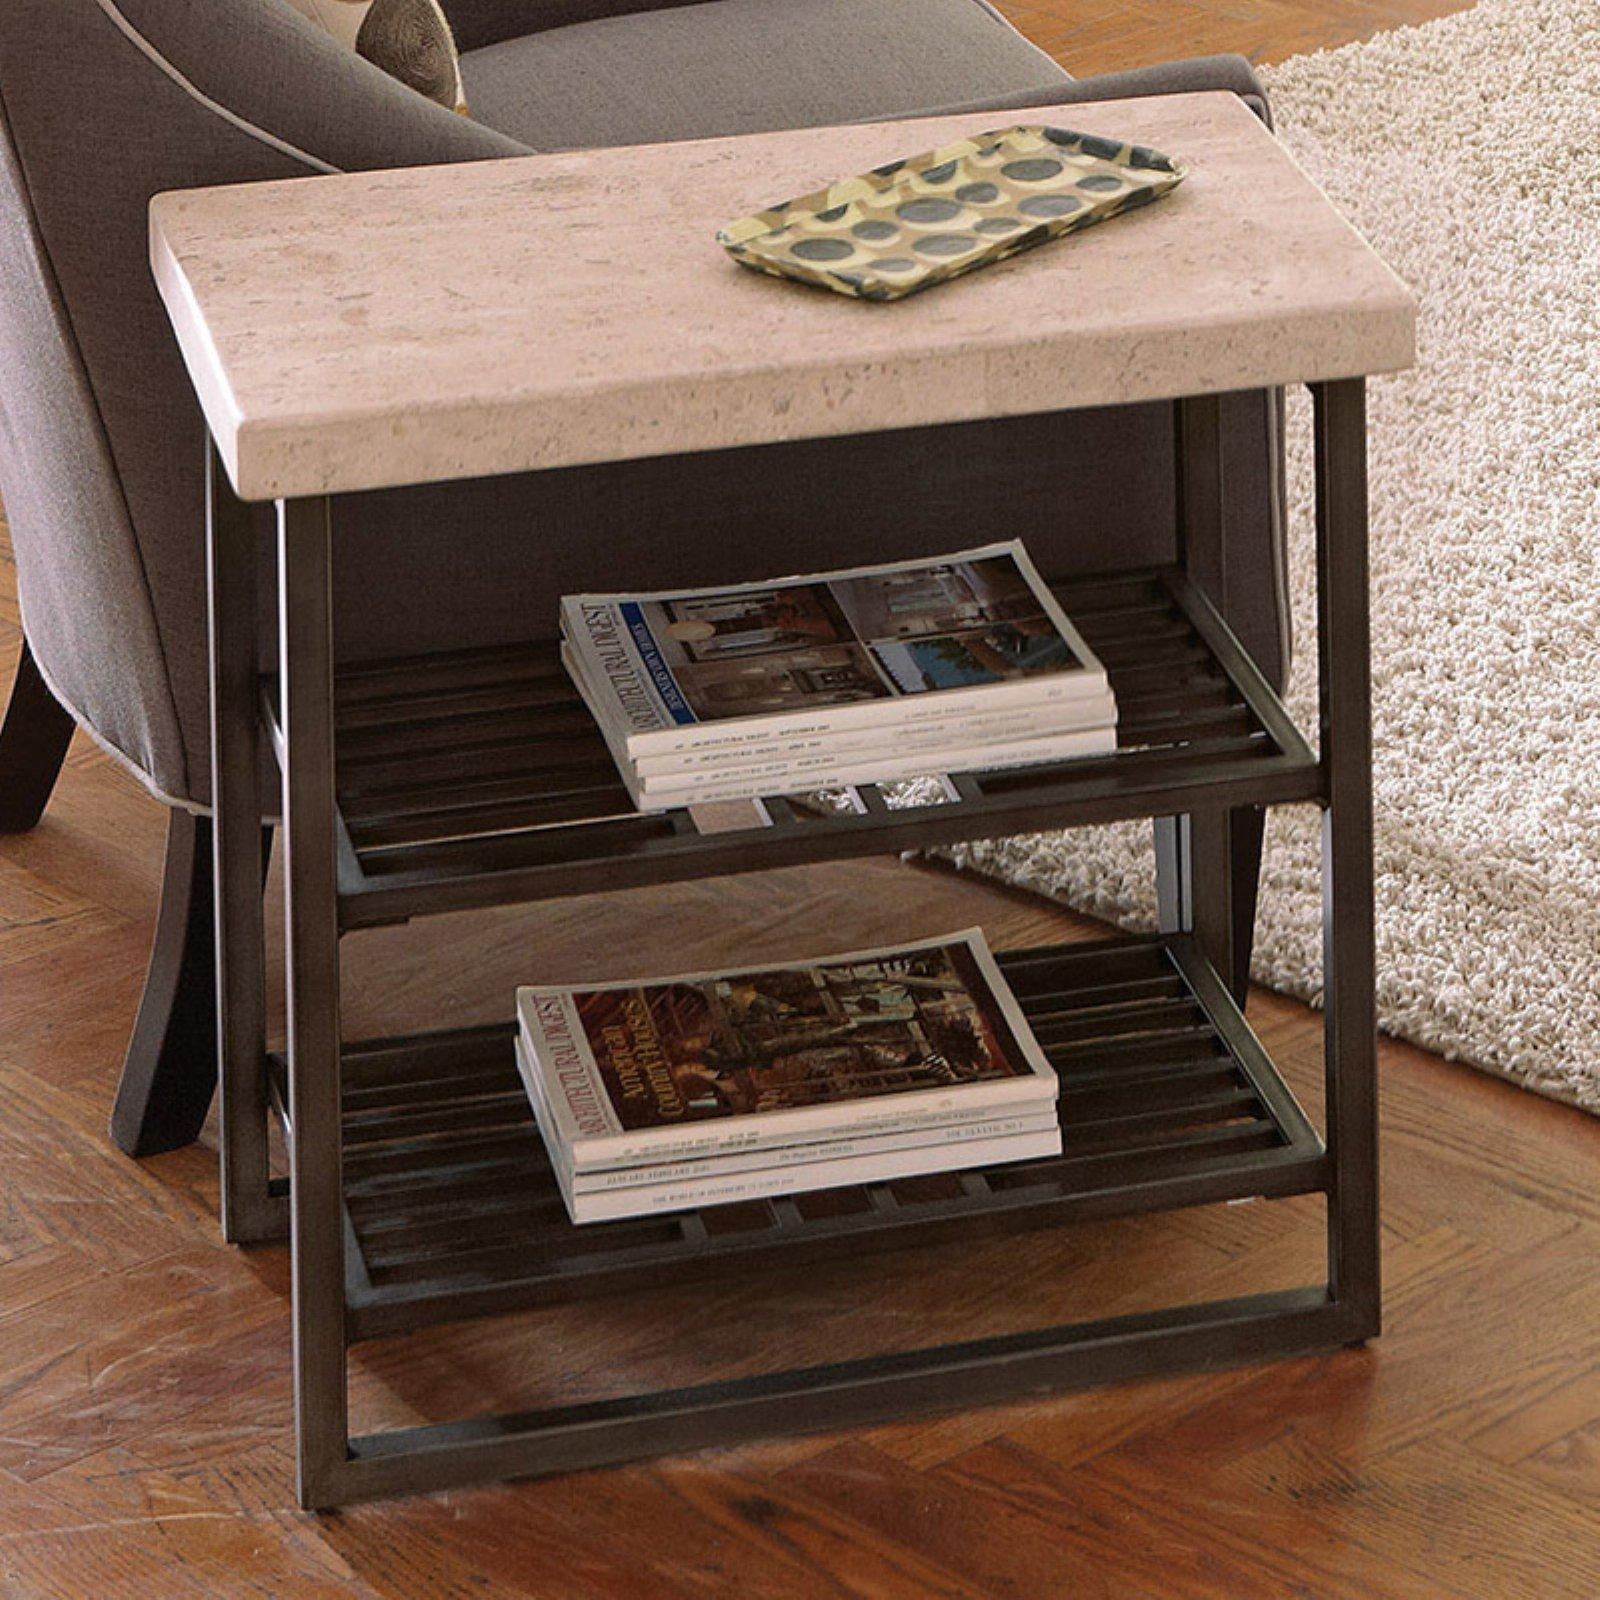 Riverside Capri Chair Side Table - Alabaster Travertine